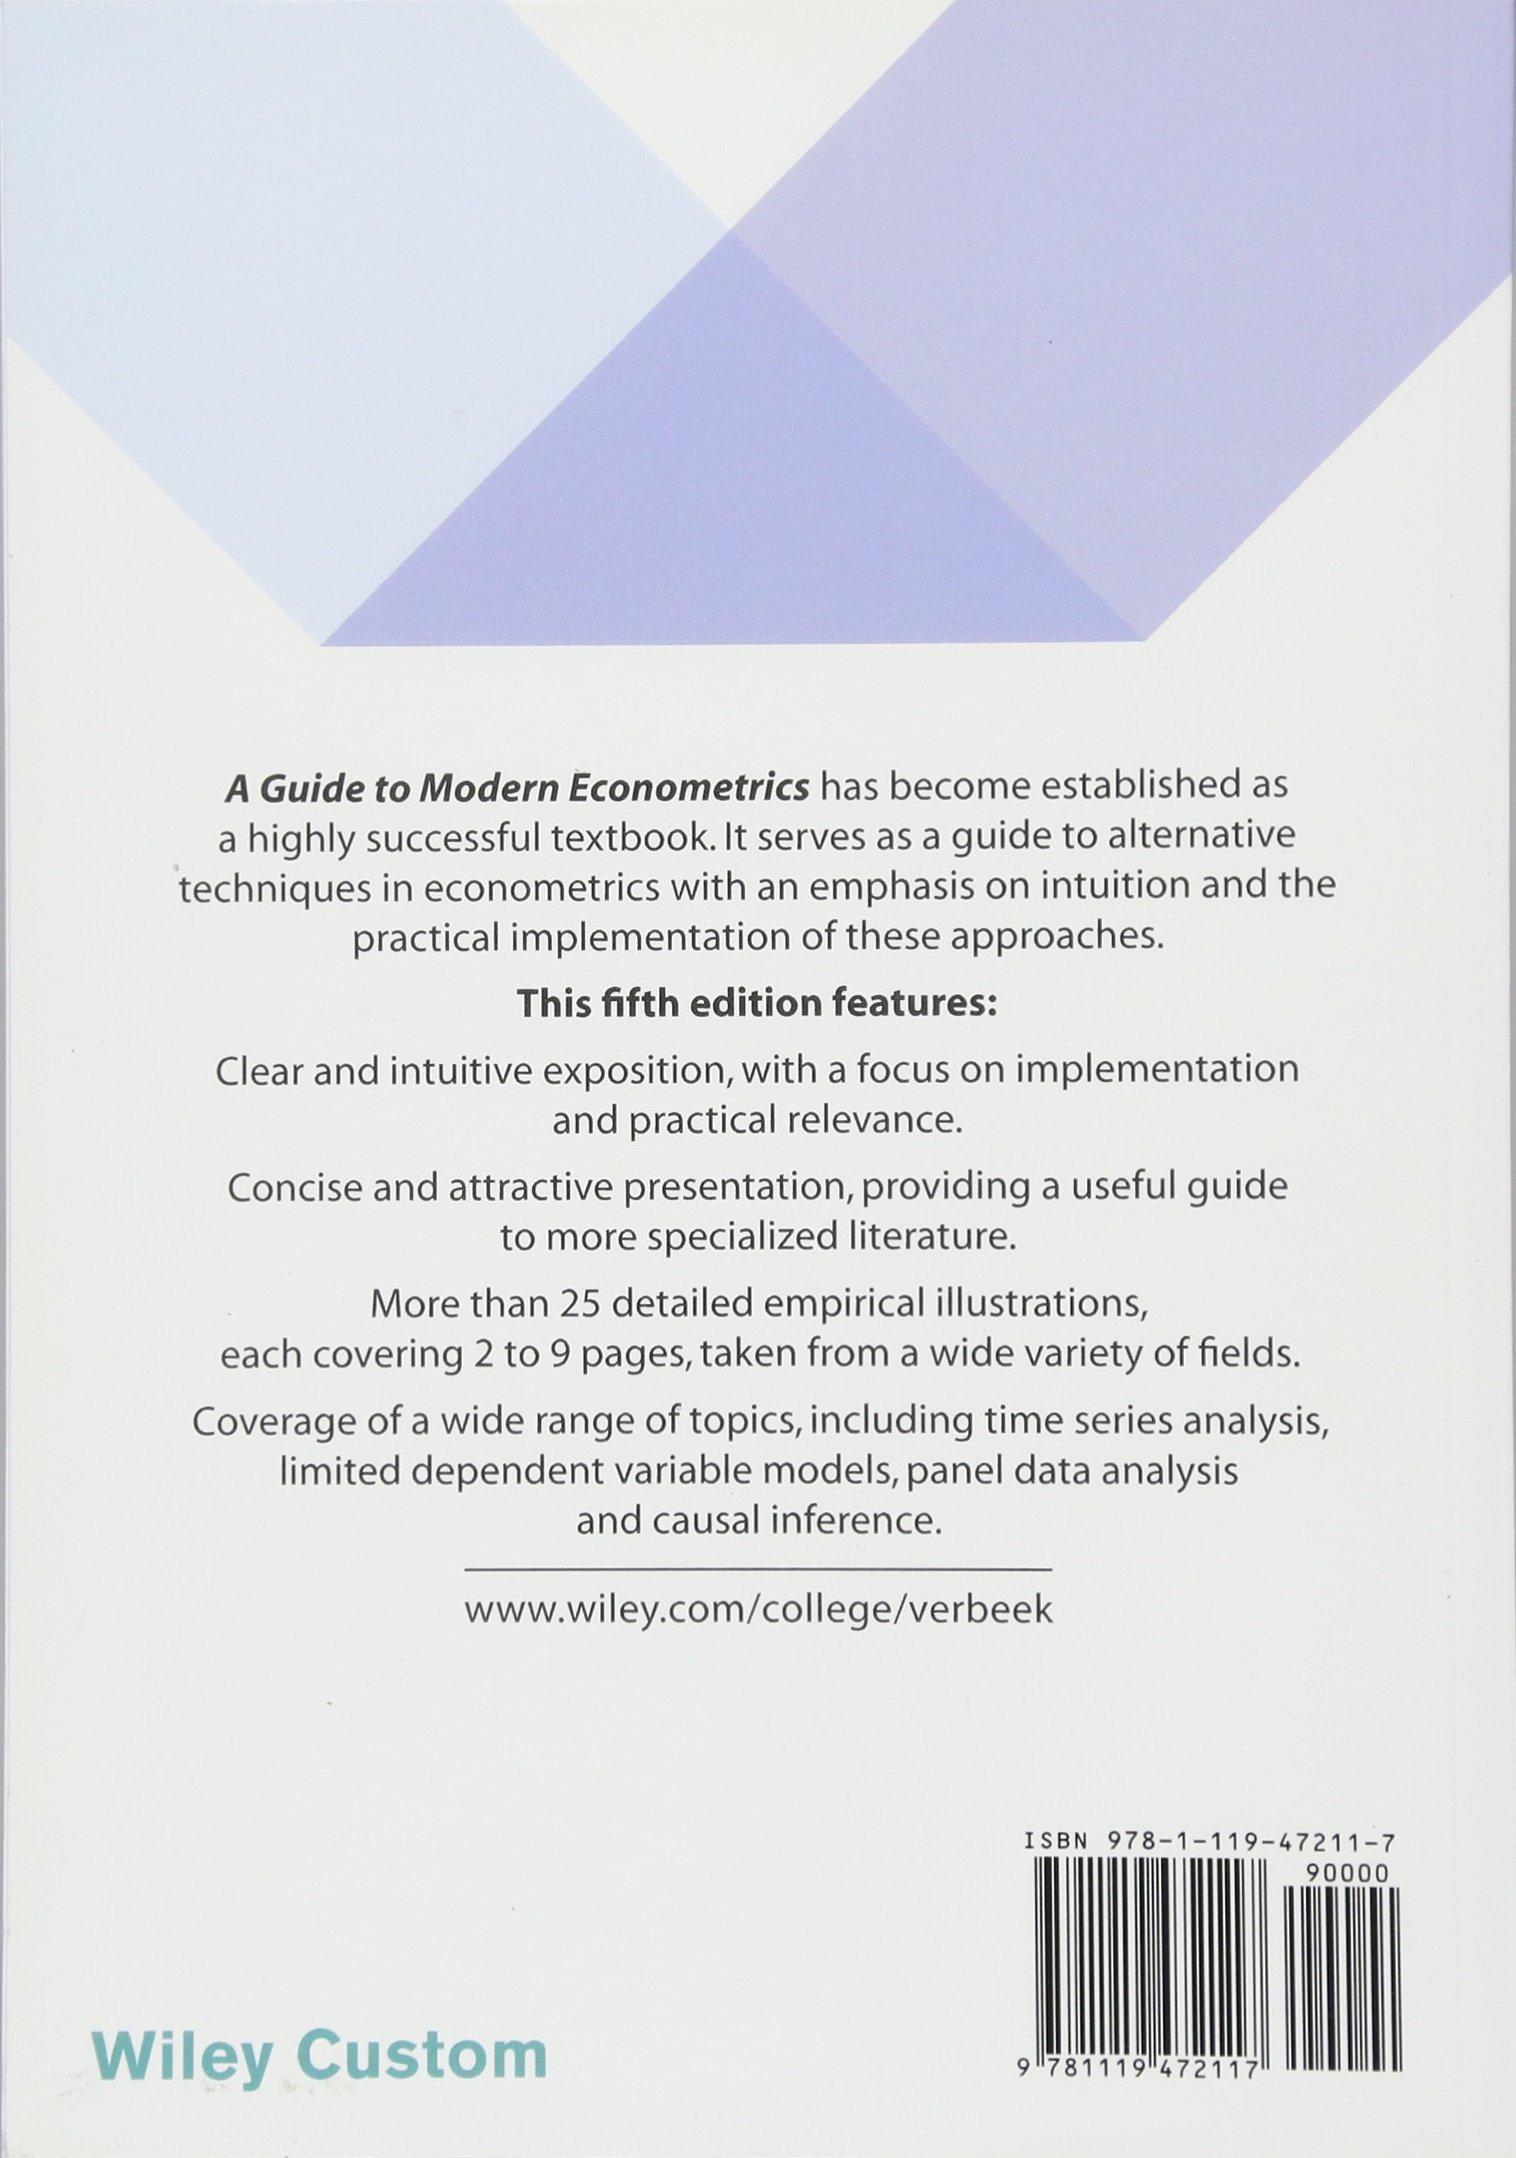 modern econometrics verbeek solution manual today manual guide rh brookejasmine co User Guide marno verbeek a guide to modern econometrics solution manual